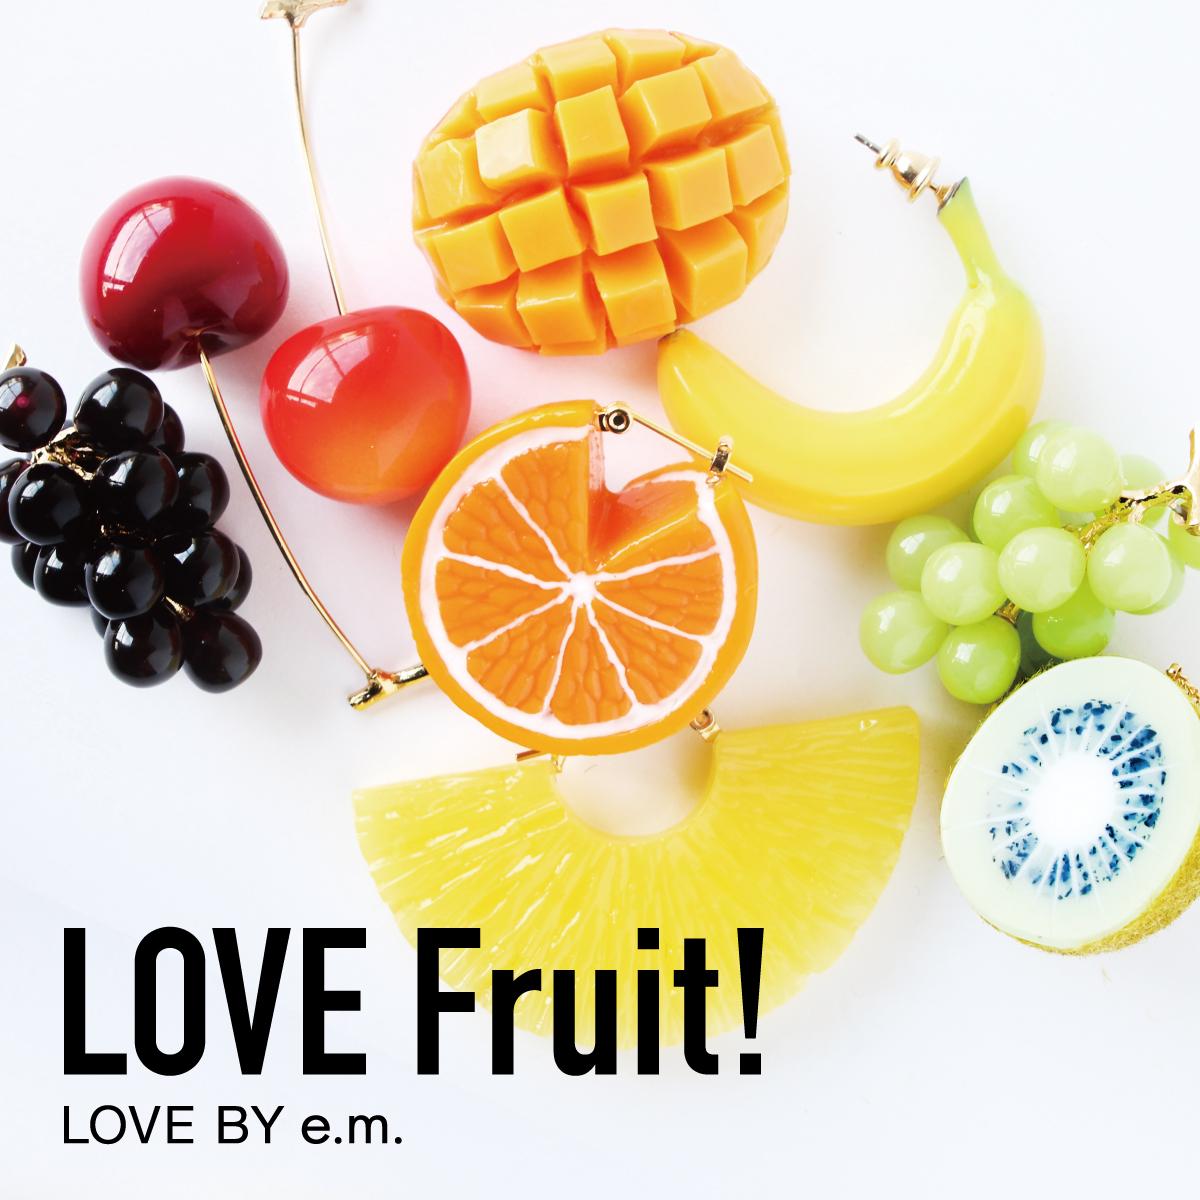 lovefruit